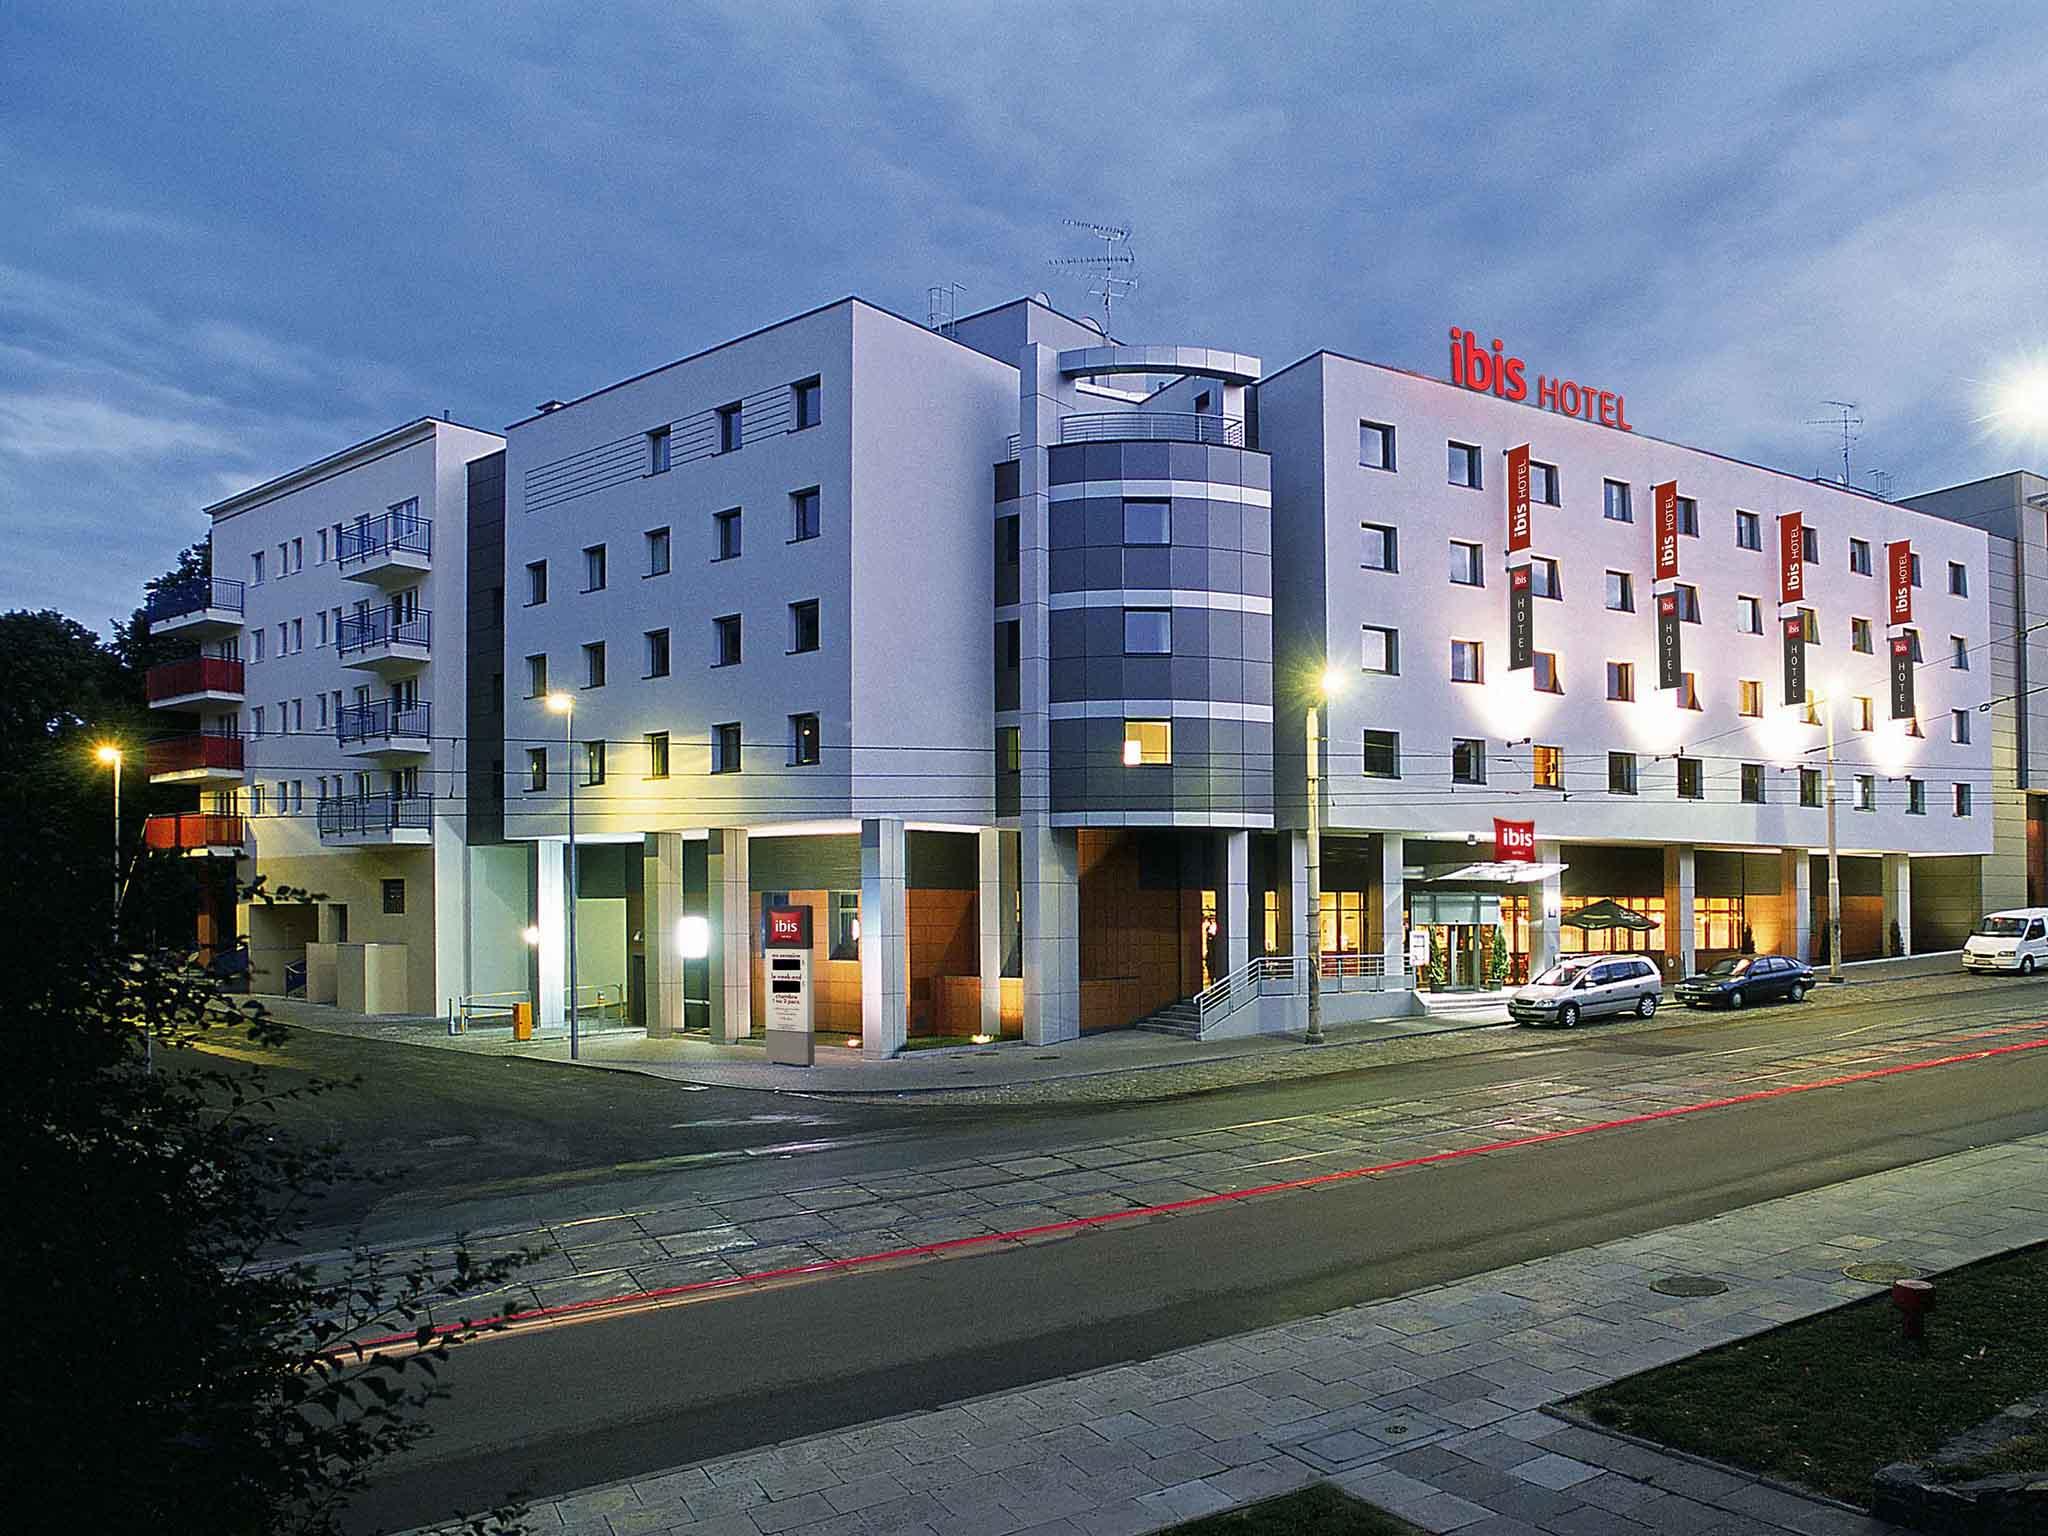 Hotel Stettin